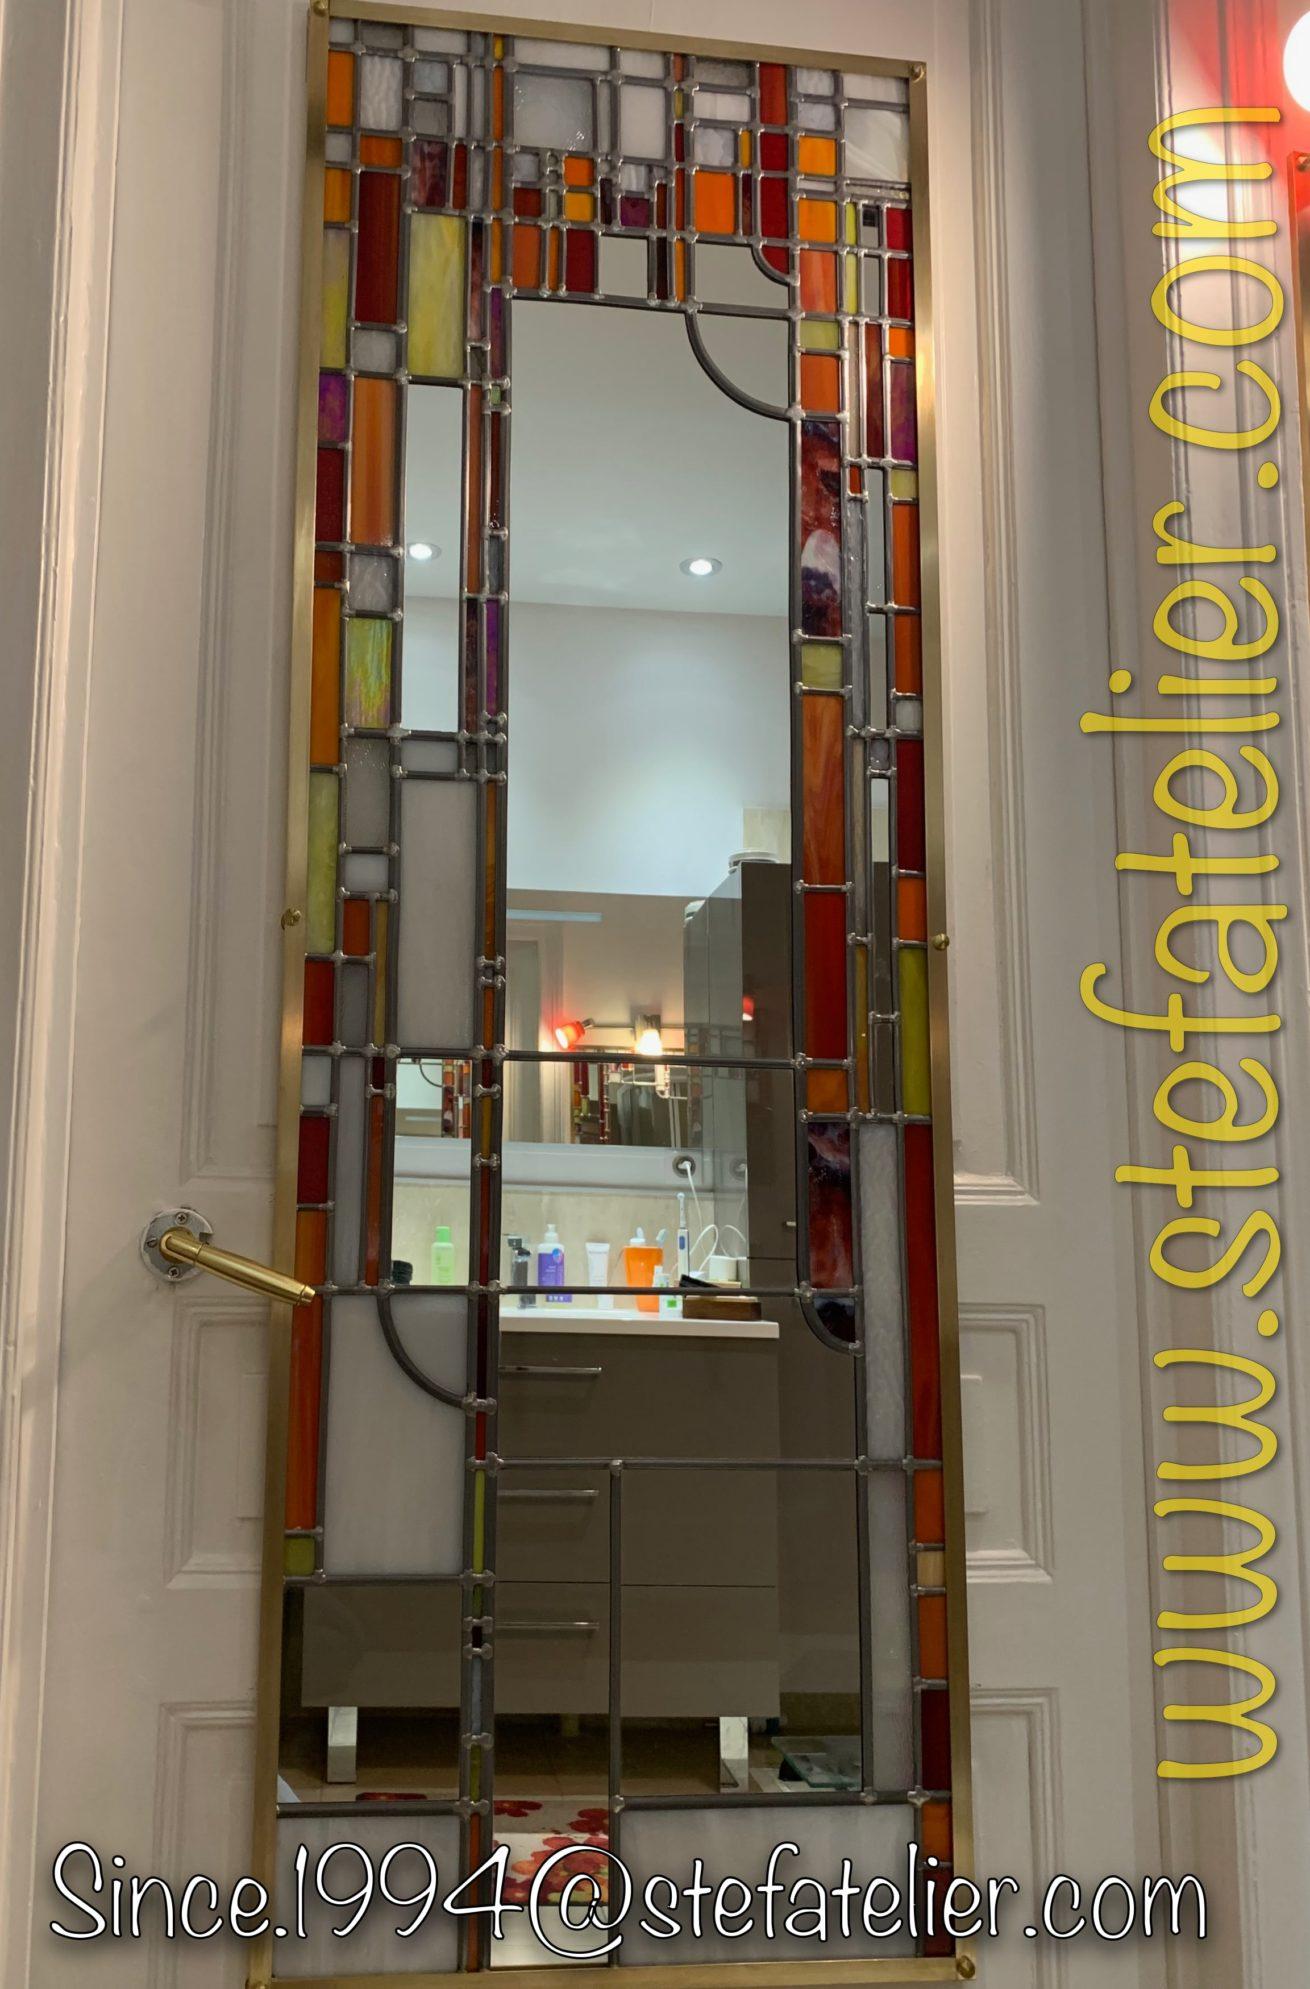 miroir vitrail rouge-orange